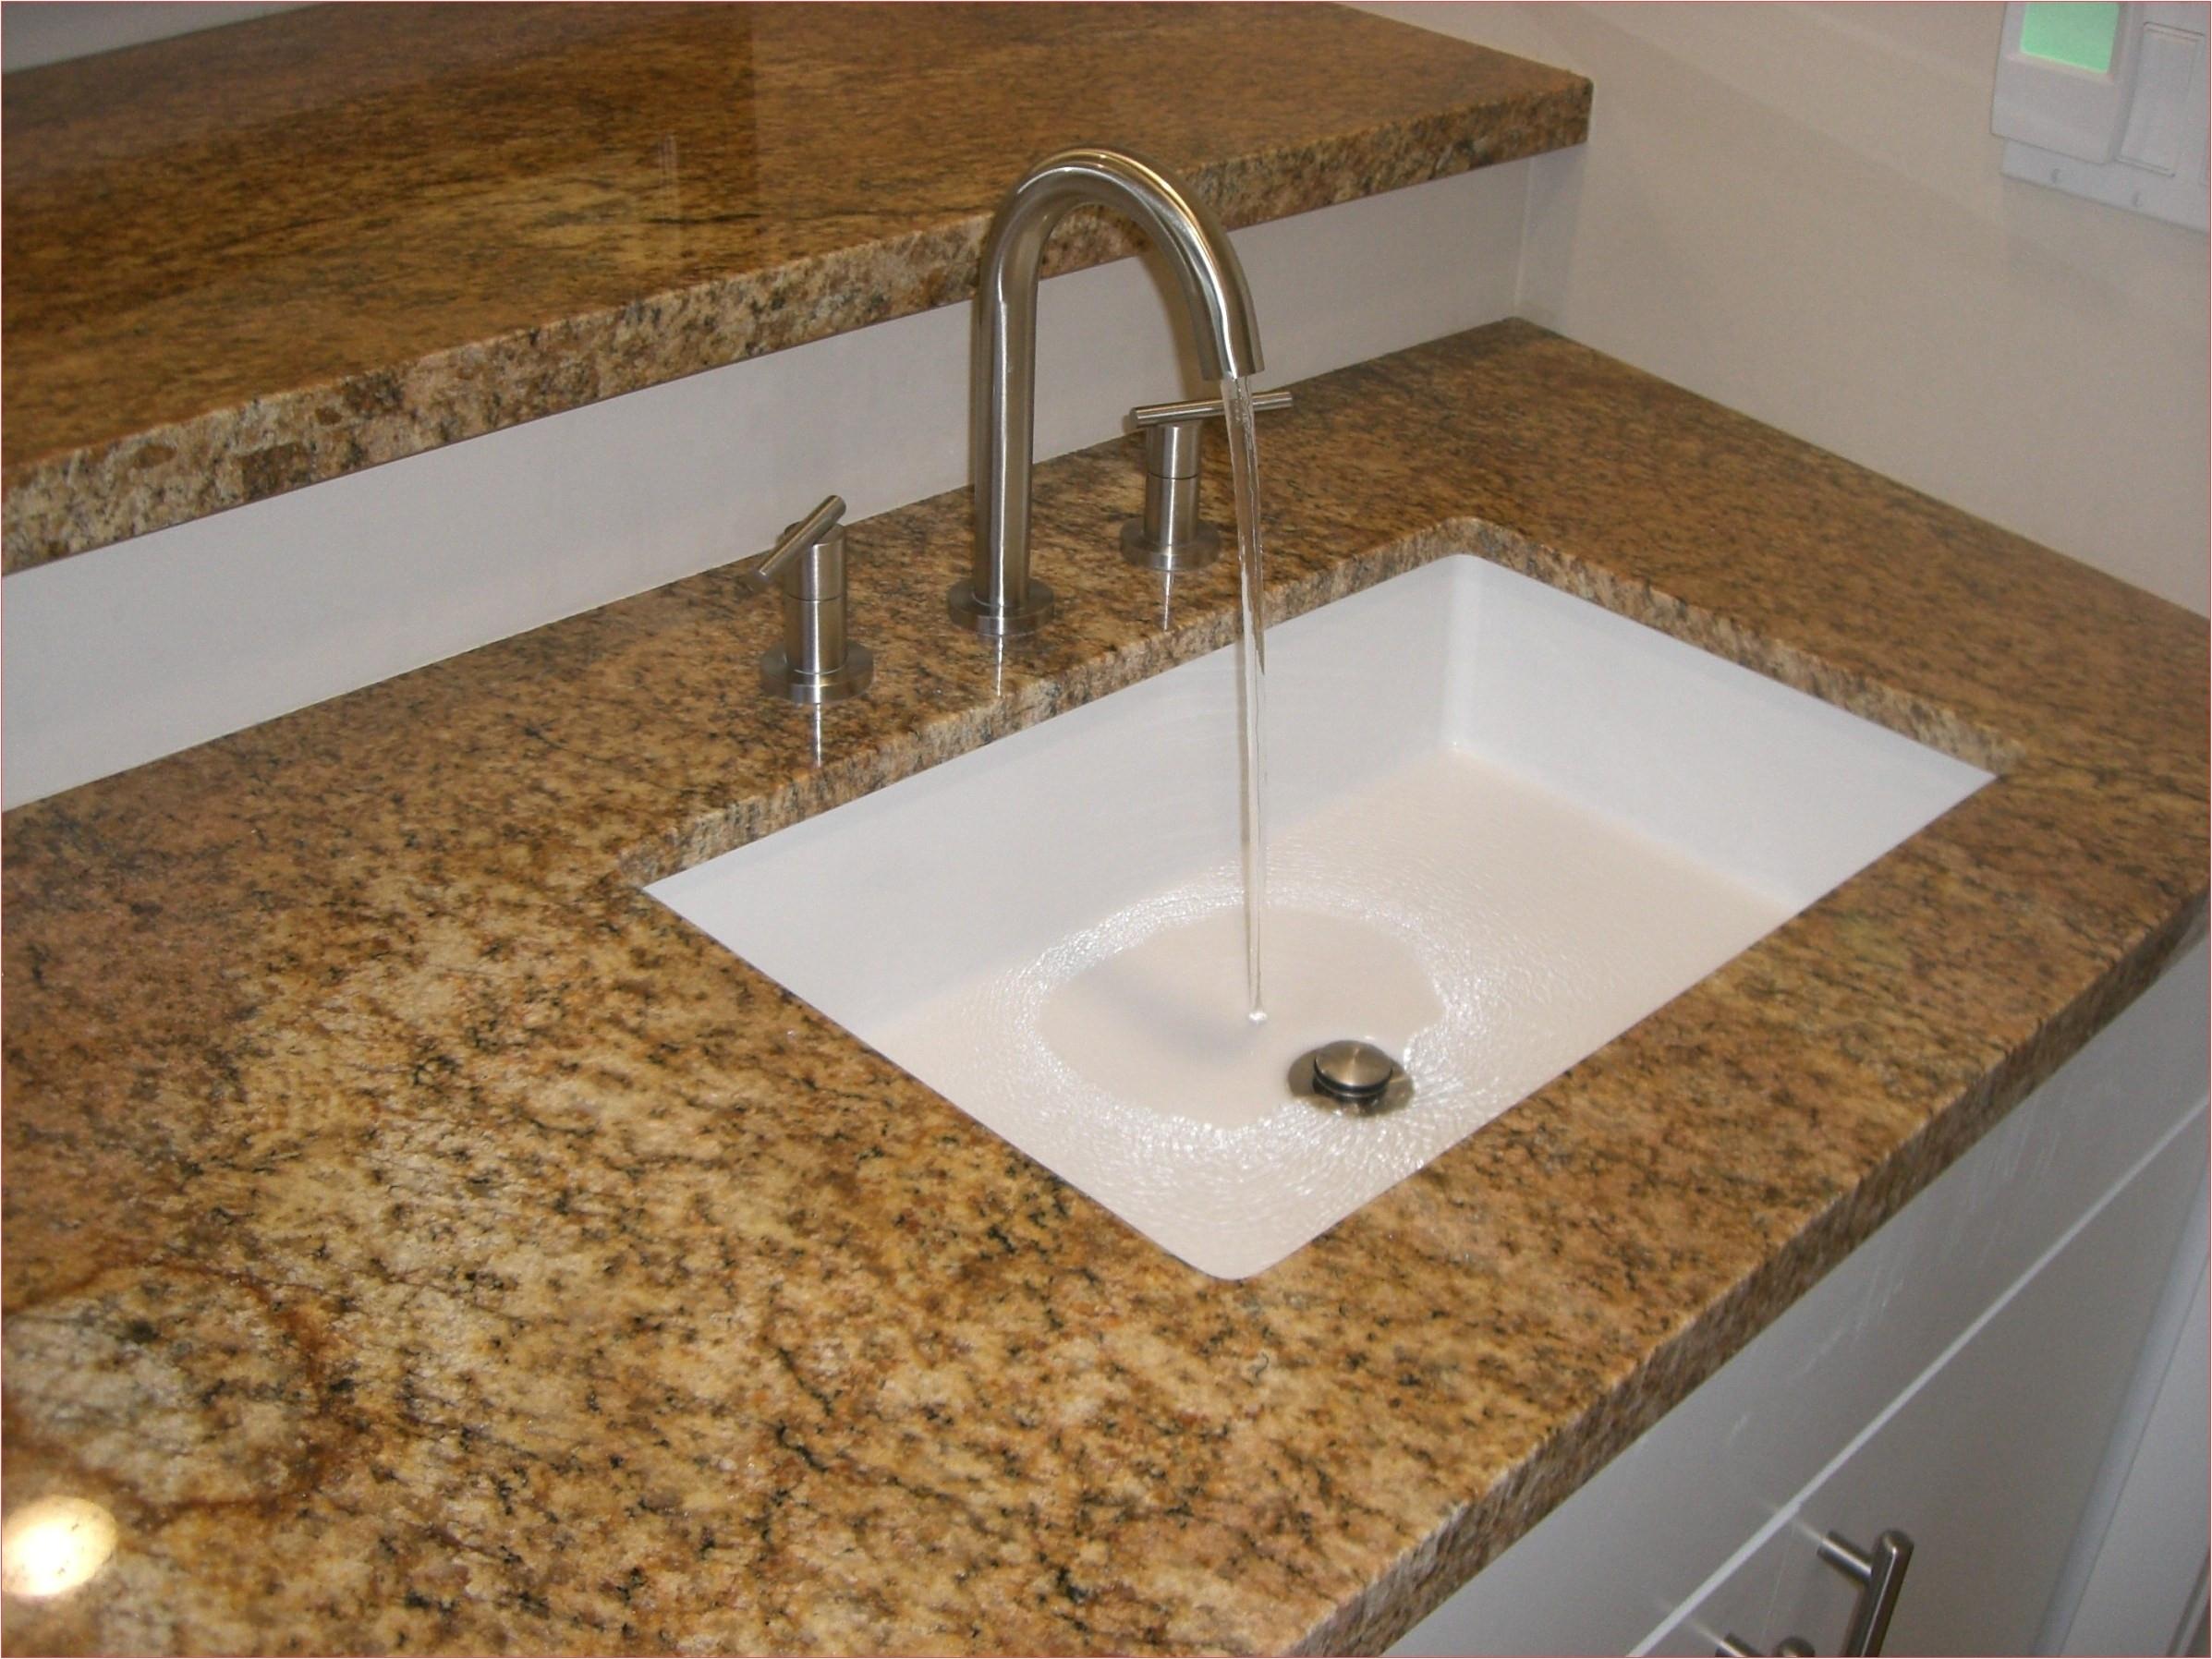 jacuzzi walk in bathtub elegant drop in bathtub best selecting bathroom sinksh sink prices i 0d